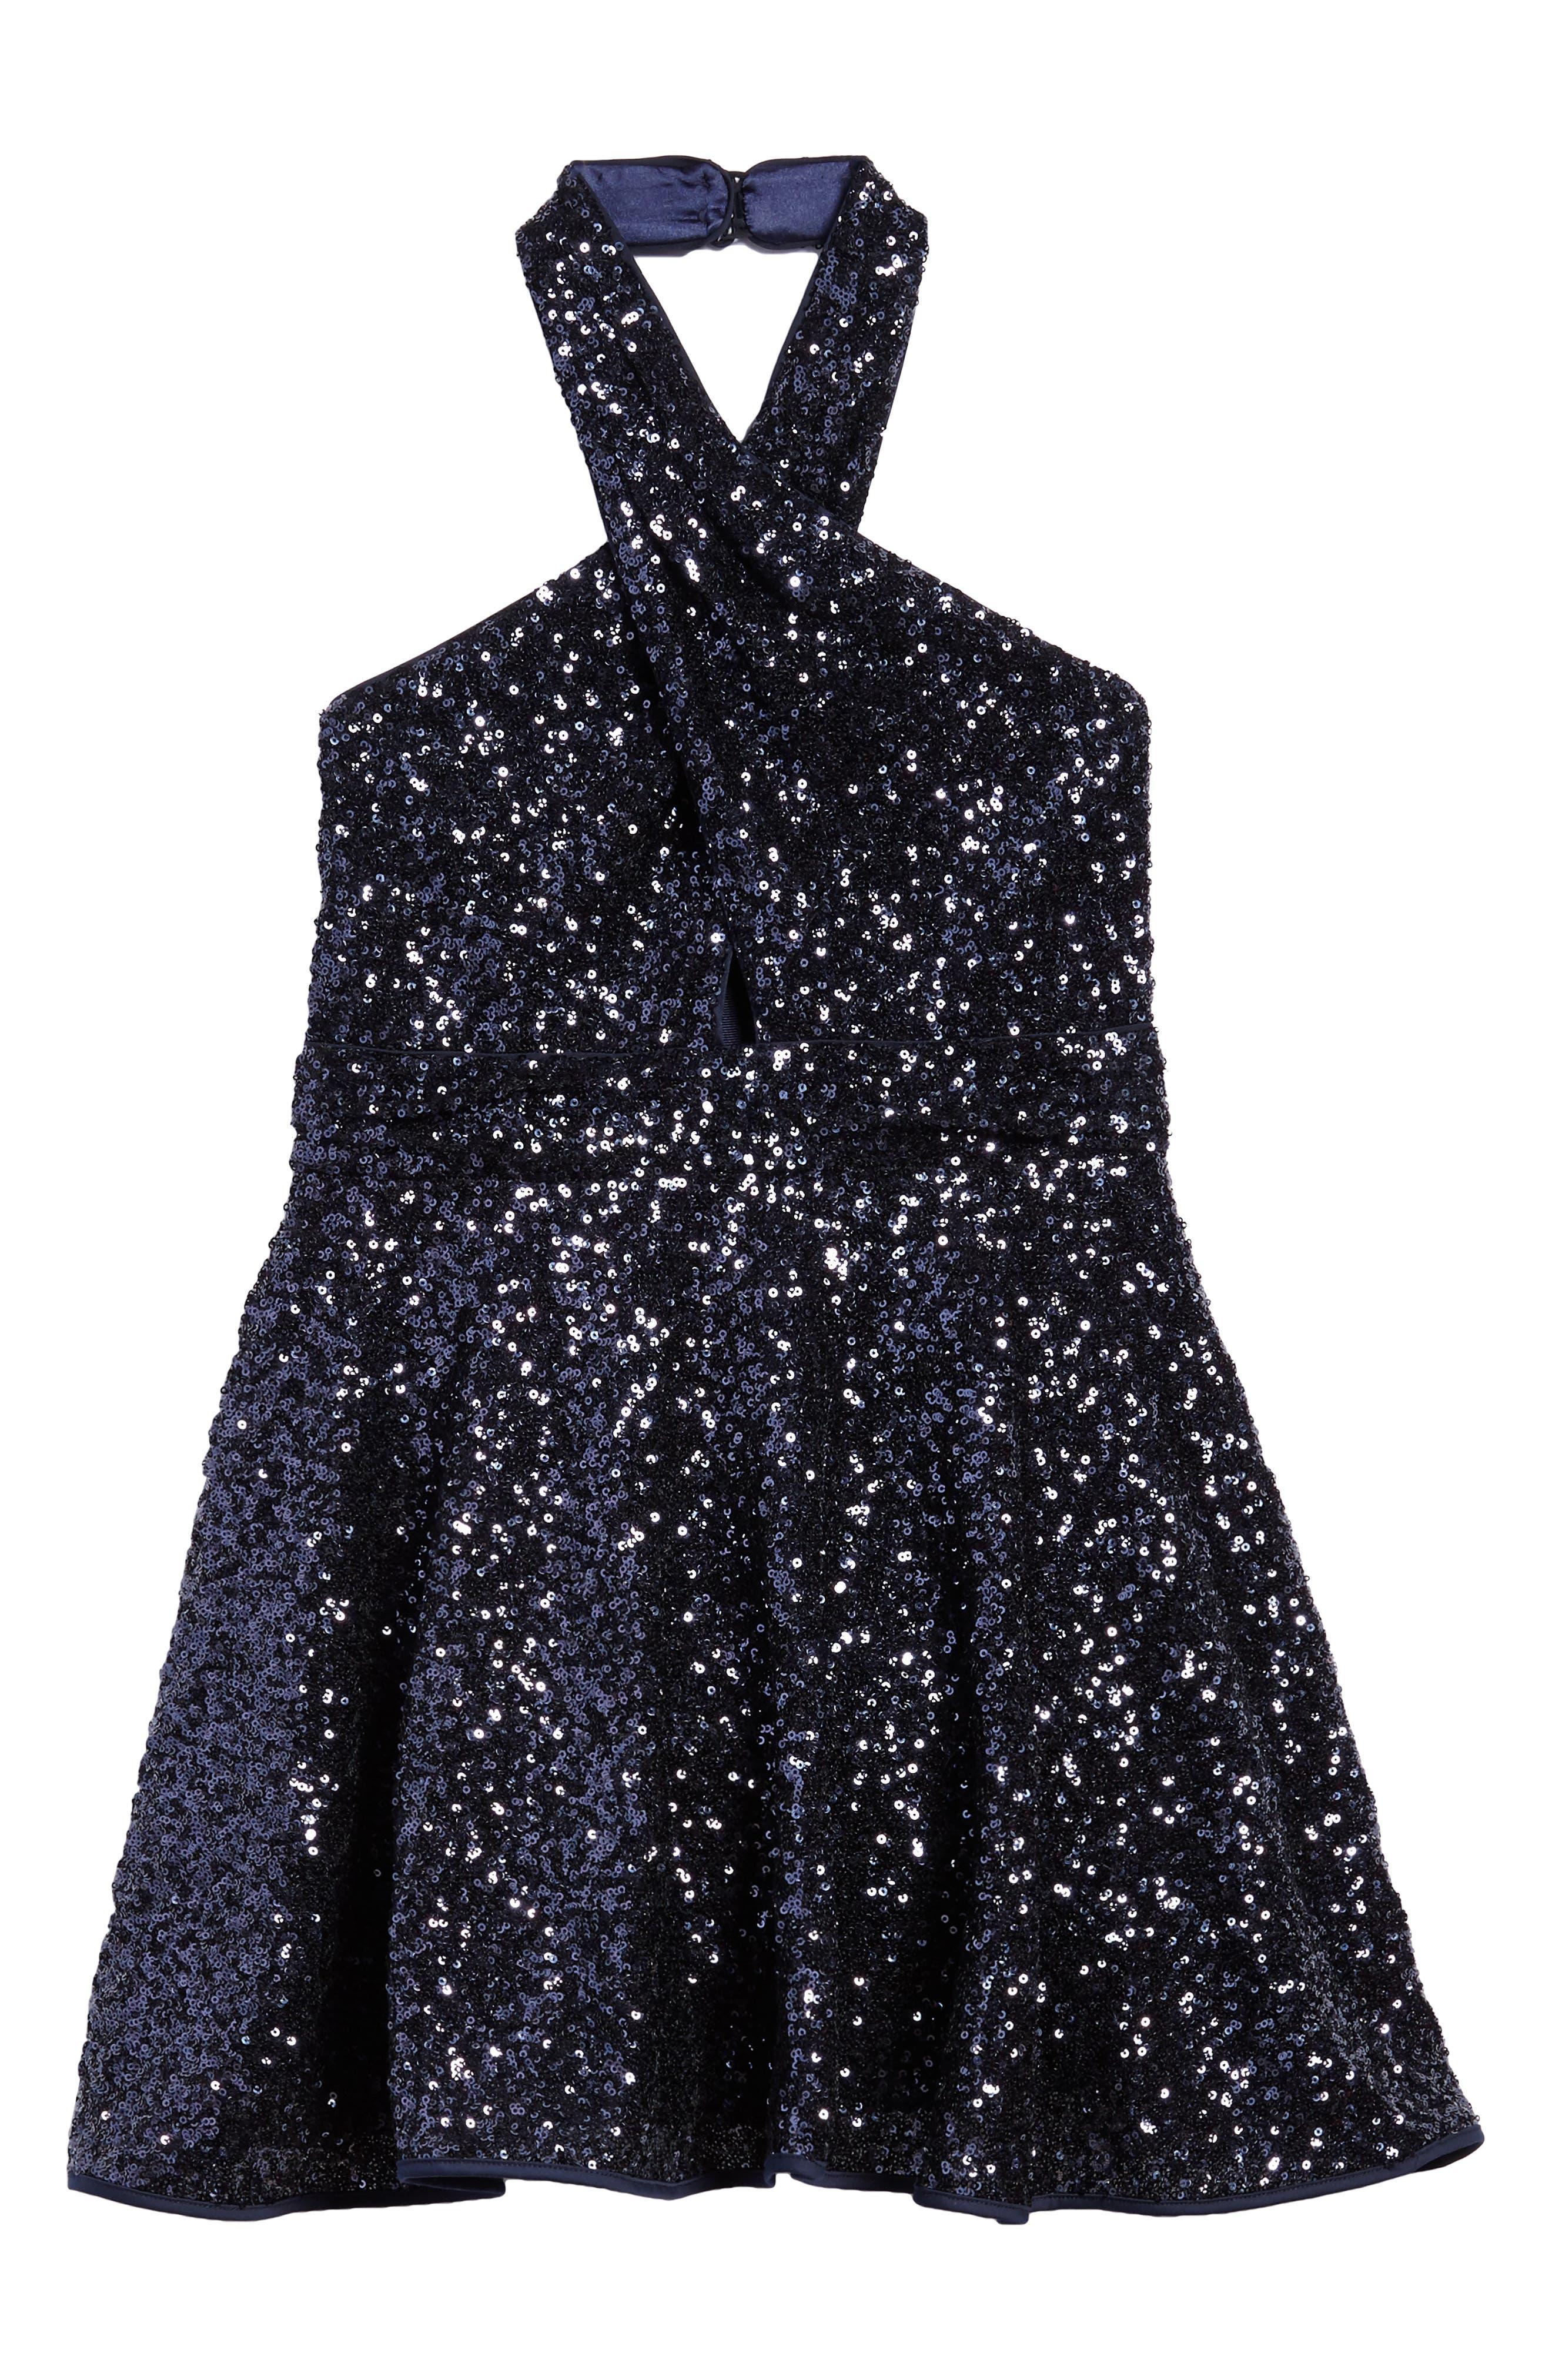 Sydney Sequin Halter Dress,                             Main thumbnail 1, color,                             410